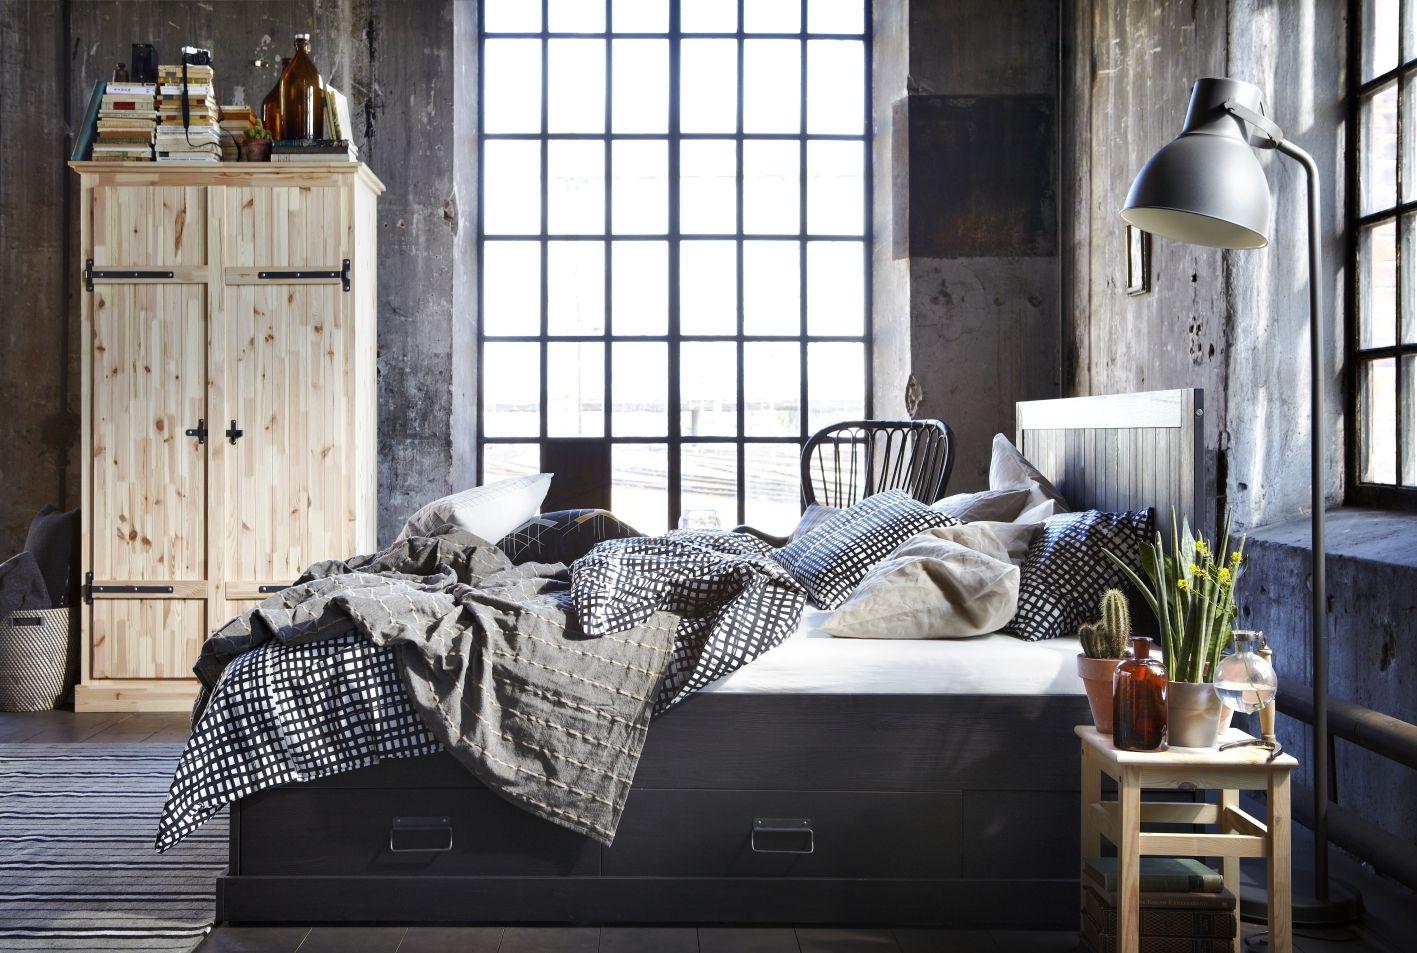 Interieur, Ikea and Catalog on Pinterest